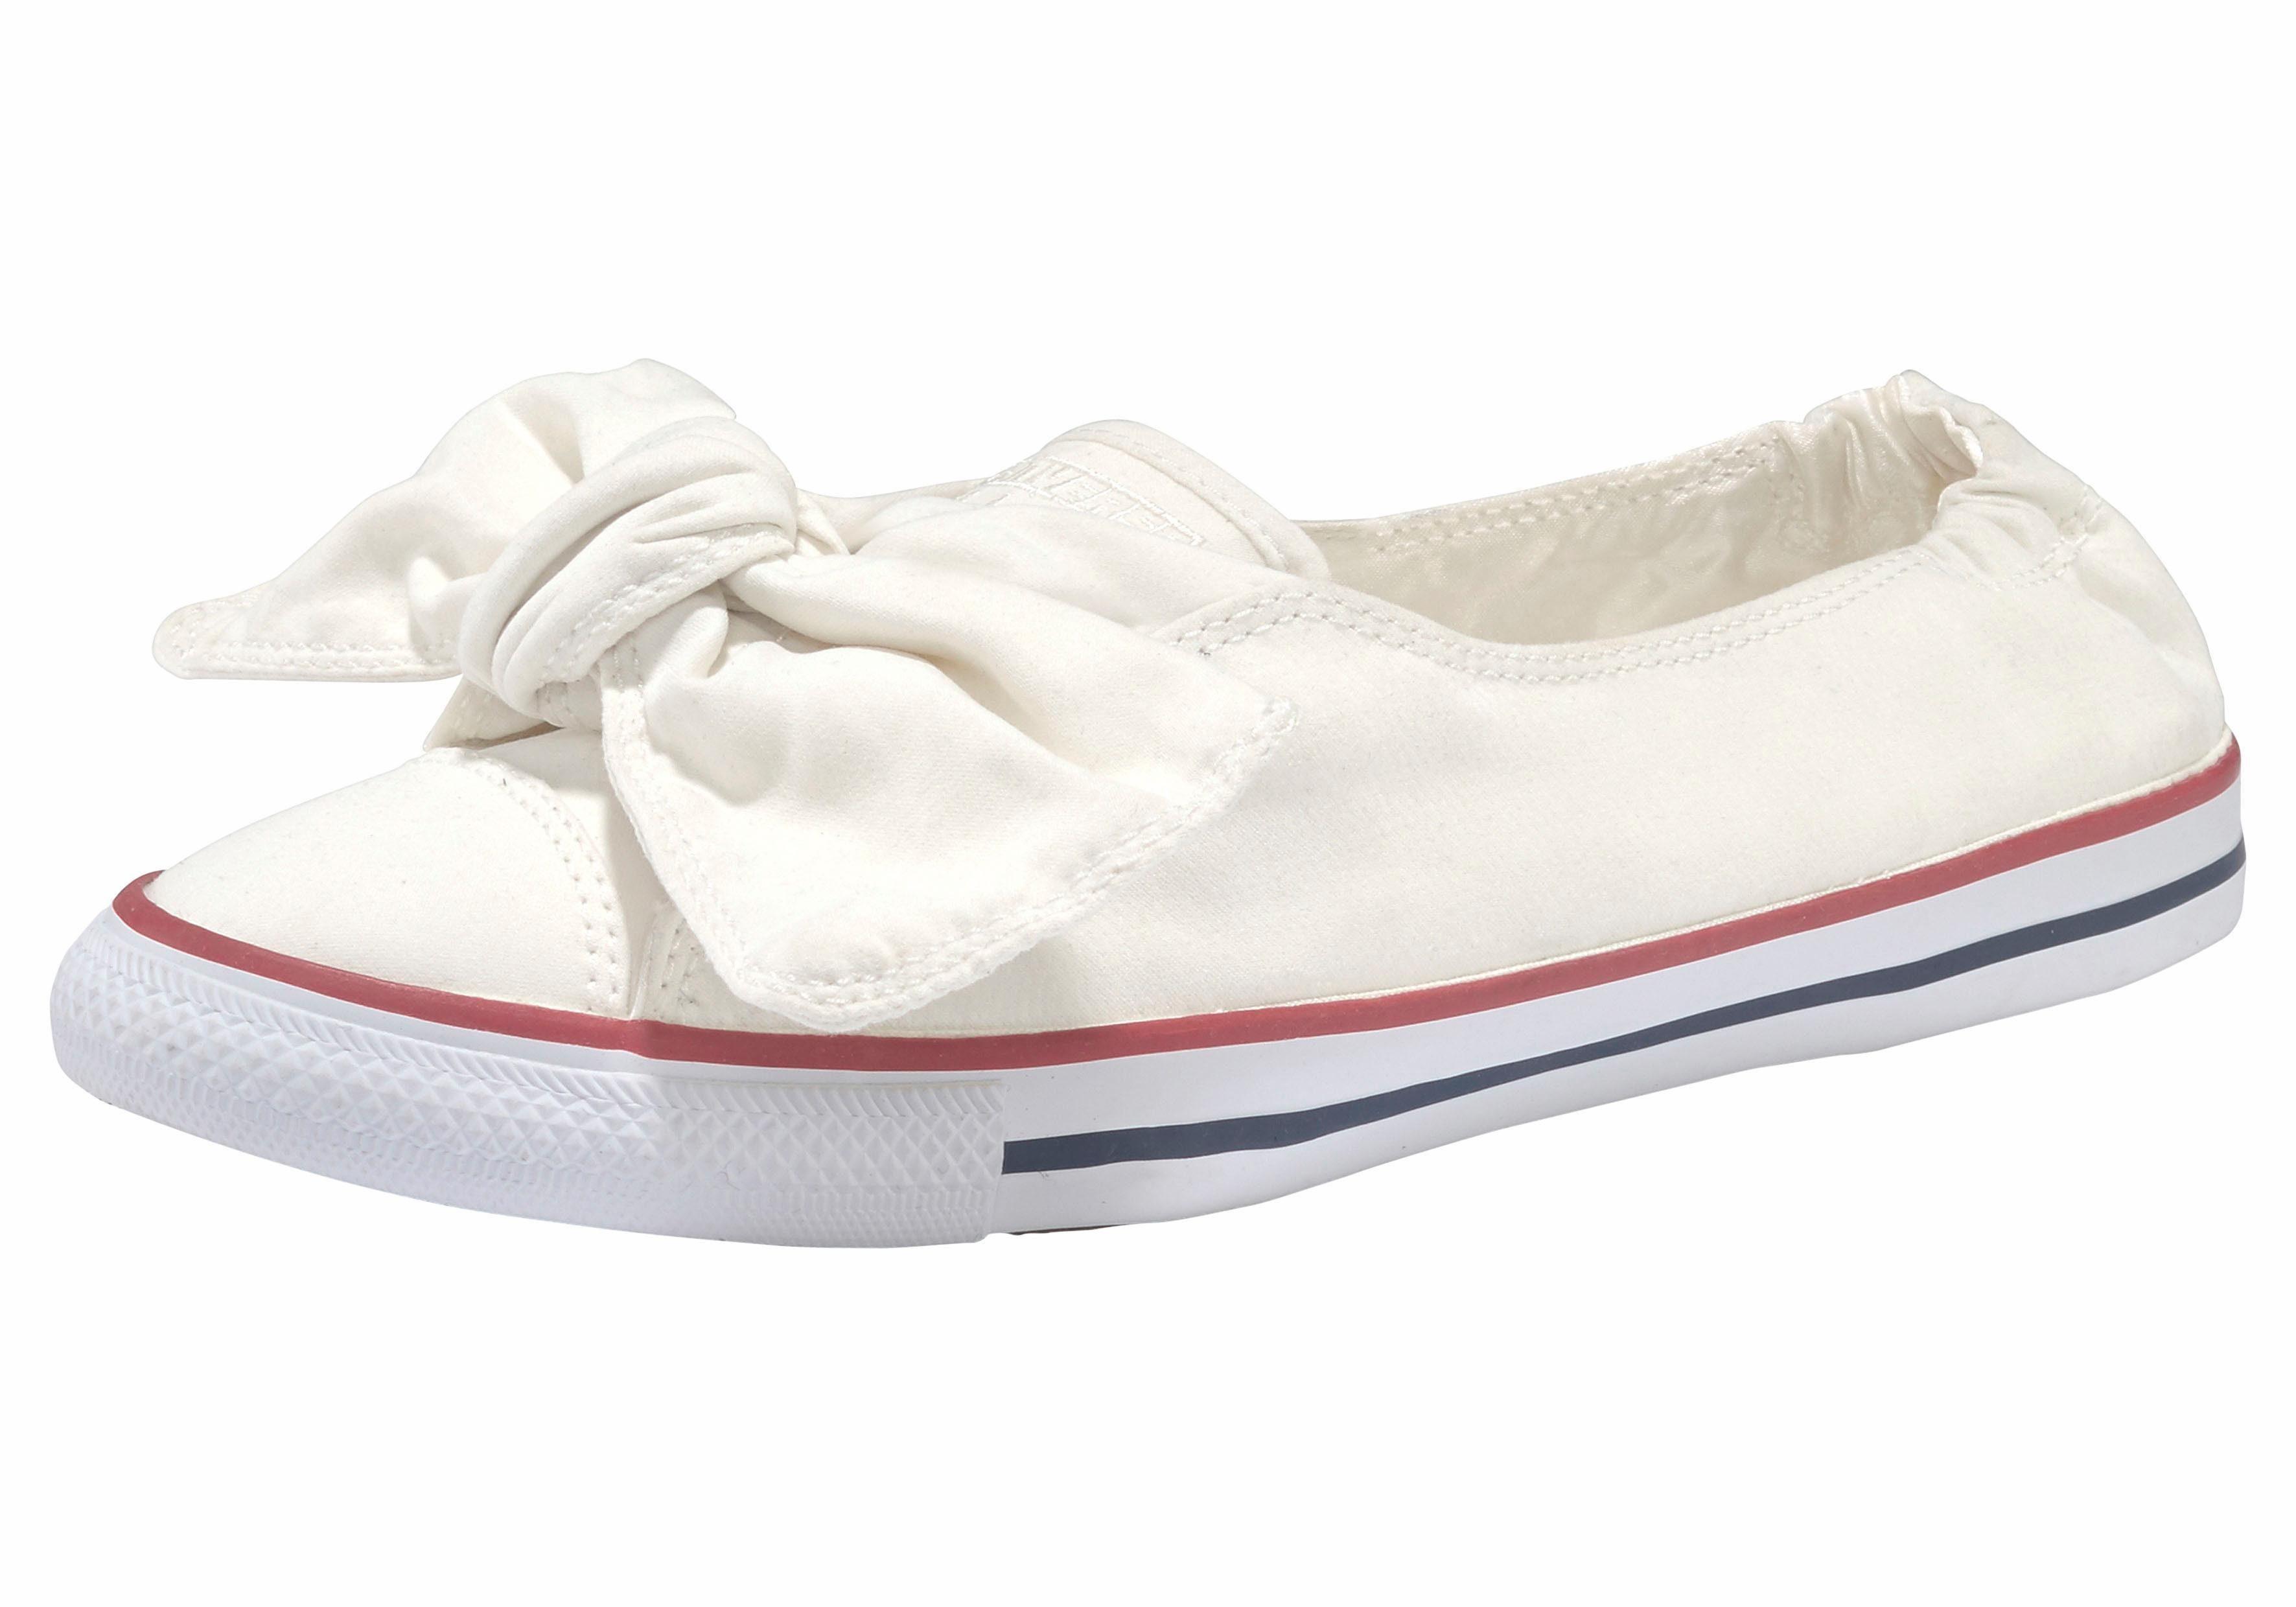 Rabatt Extrem Converse Sneaker Chuck Taylor All Star-Ox von Converse Spielraum Perfekt dwoL5YwK